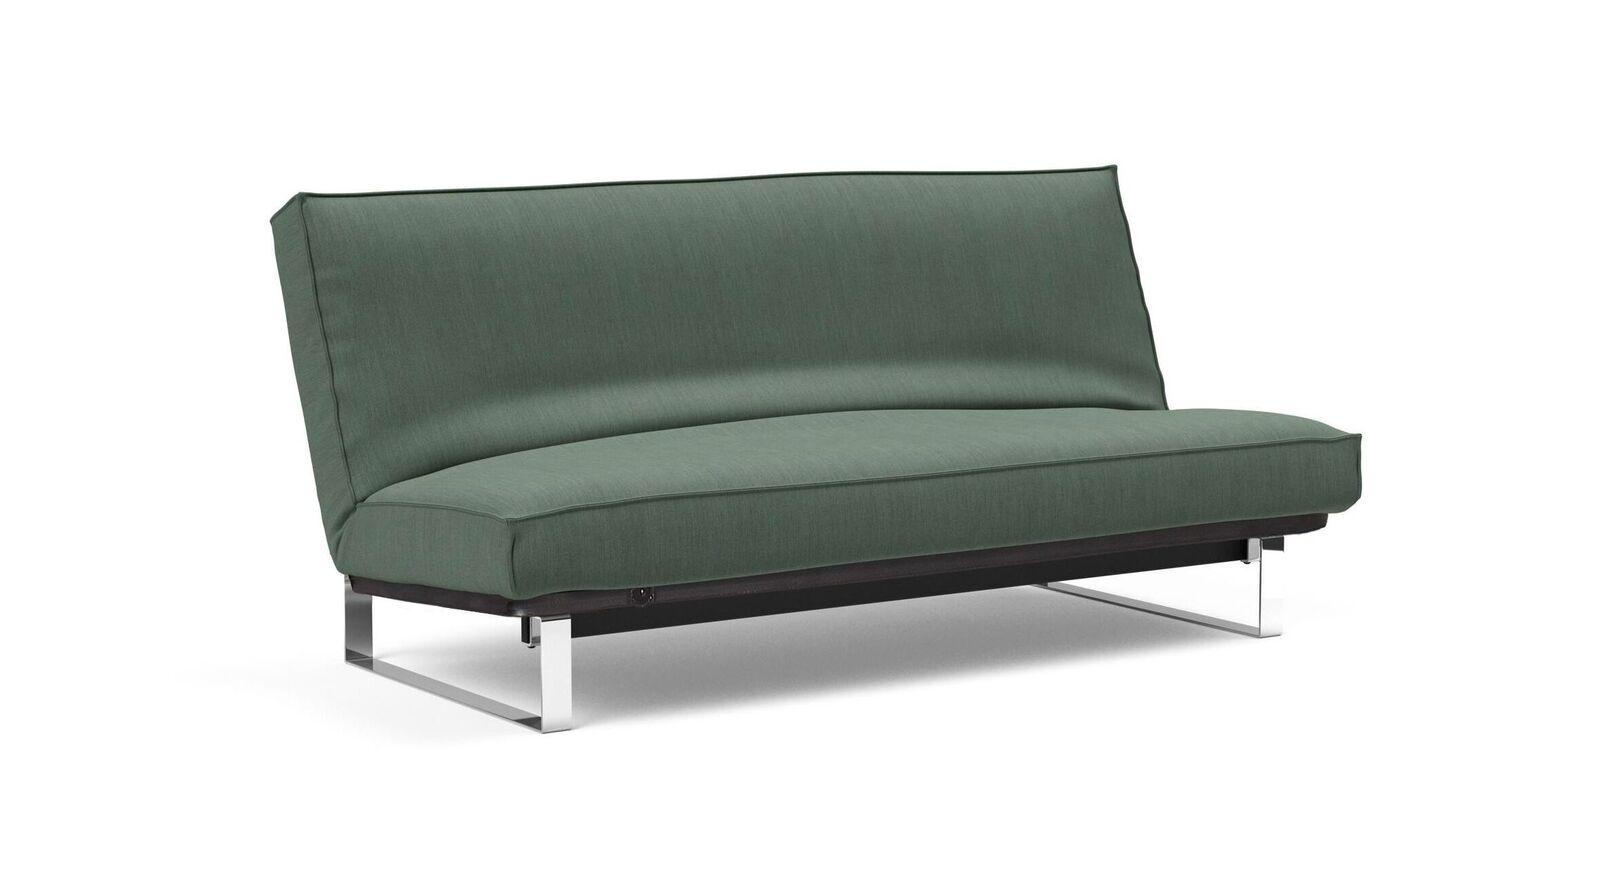 Schlafsofa Astoria in Elegance grün